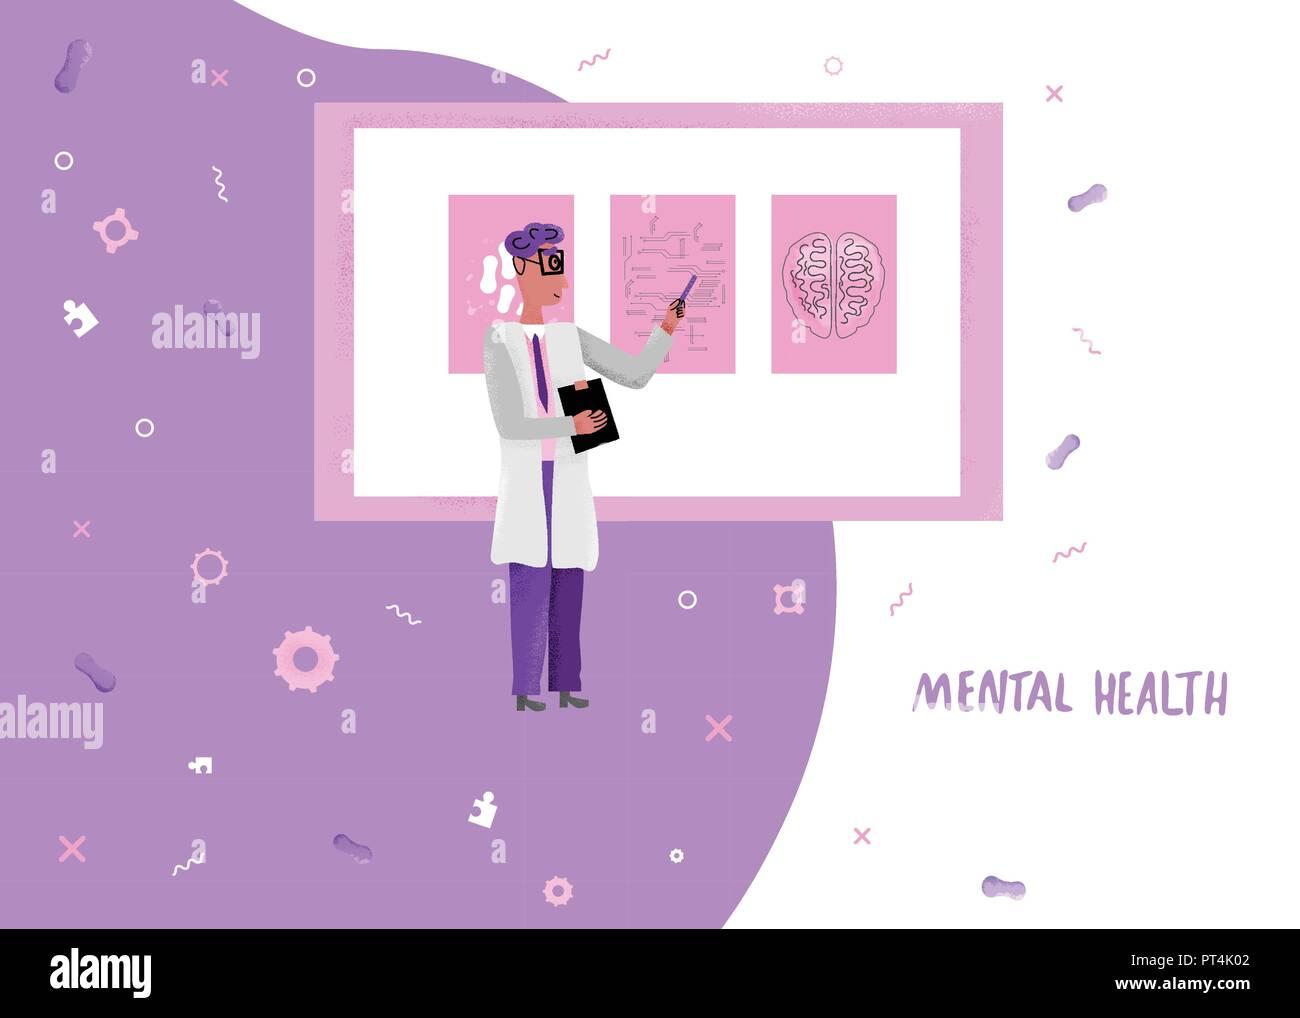 Flat Concept Of Mental Health Diagnostic Vector Banner Of Medical Mental Diagnostics Results Stock Vector Image Art Alamy